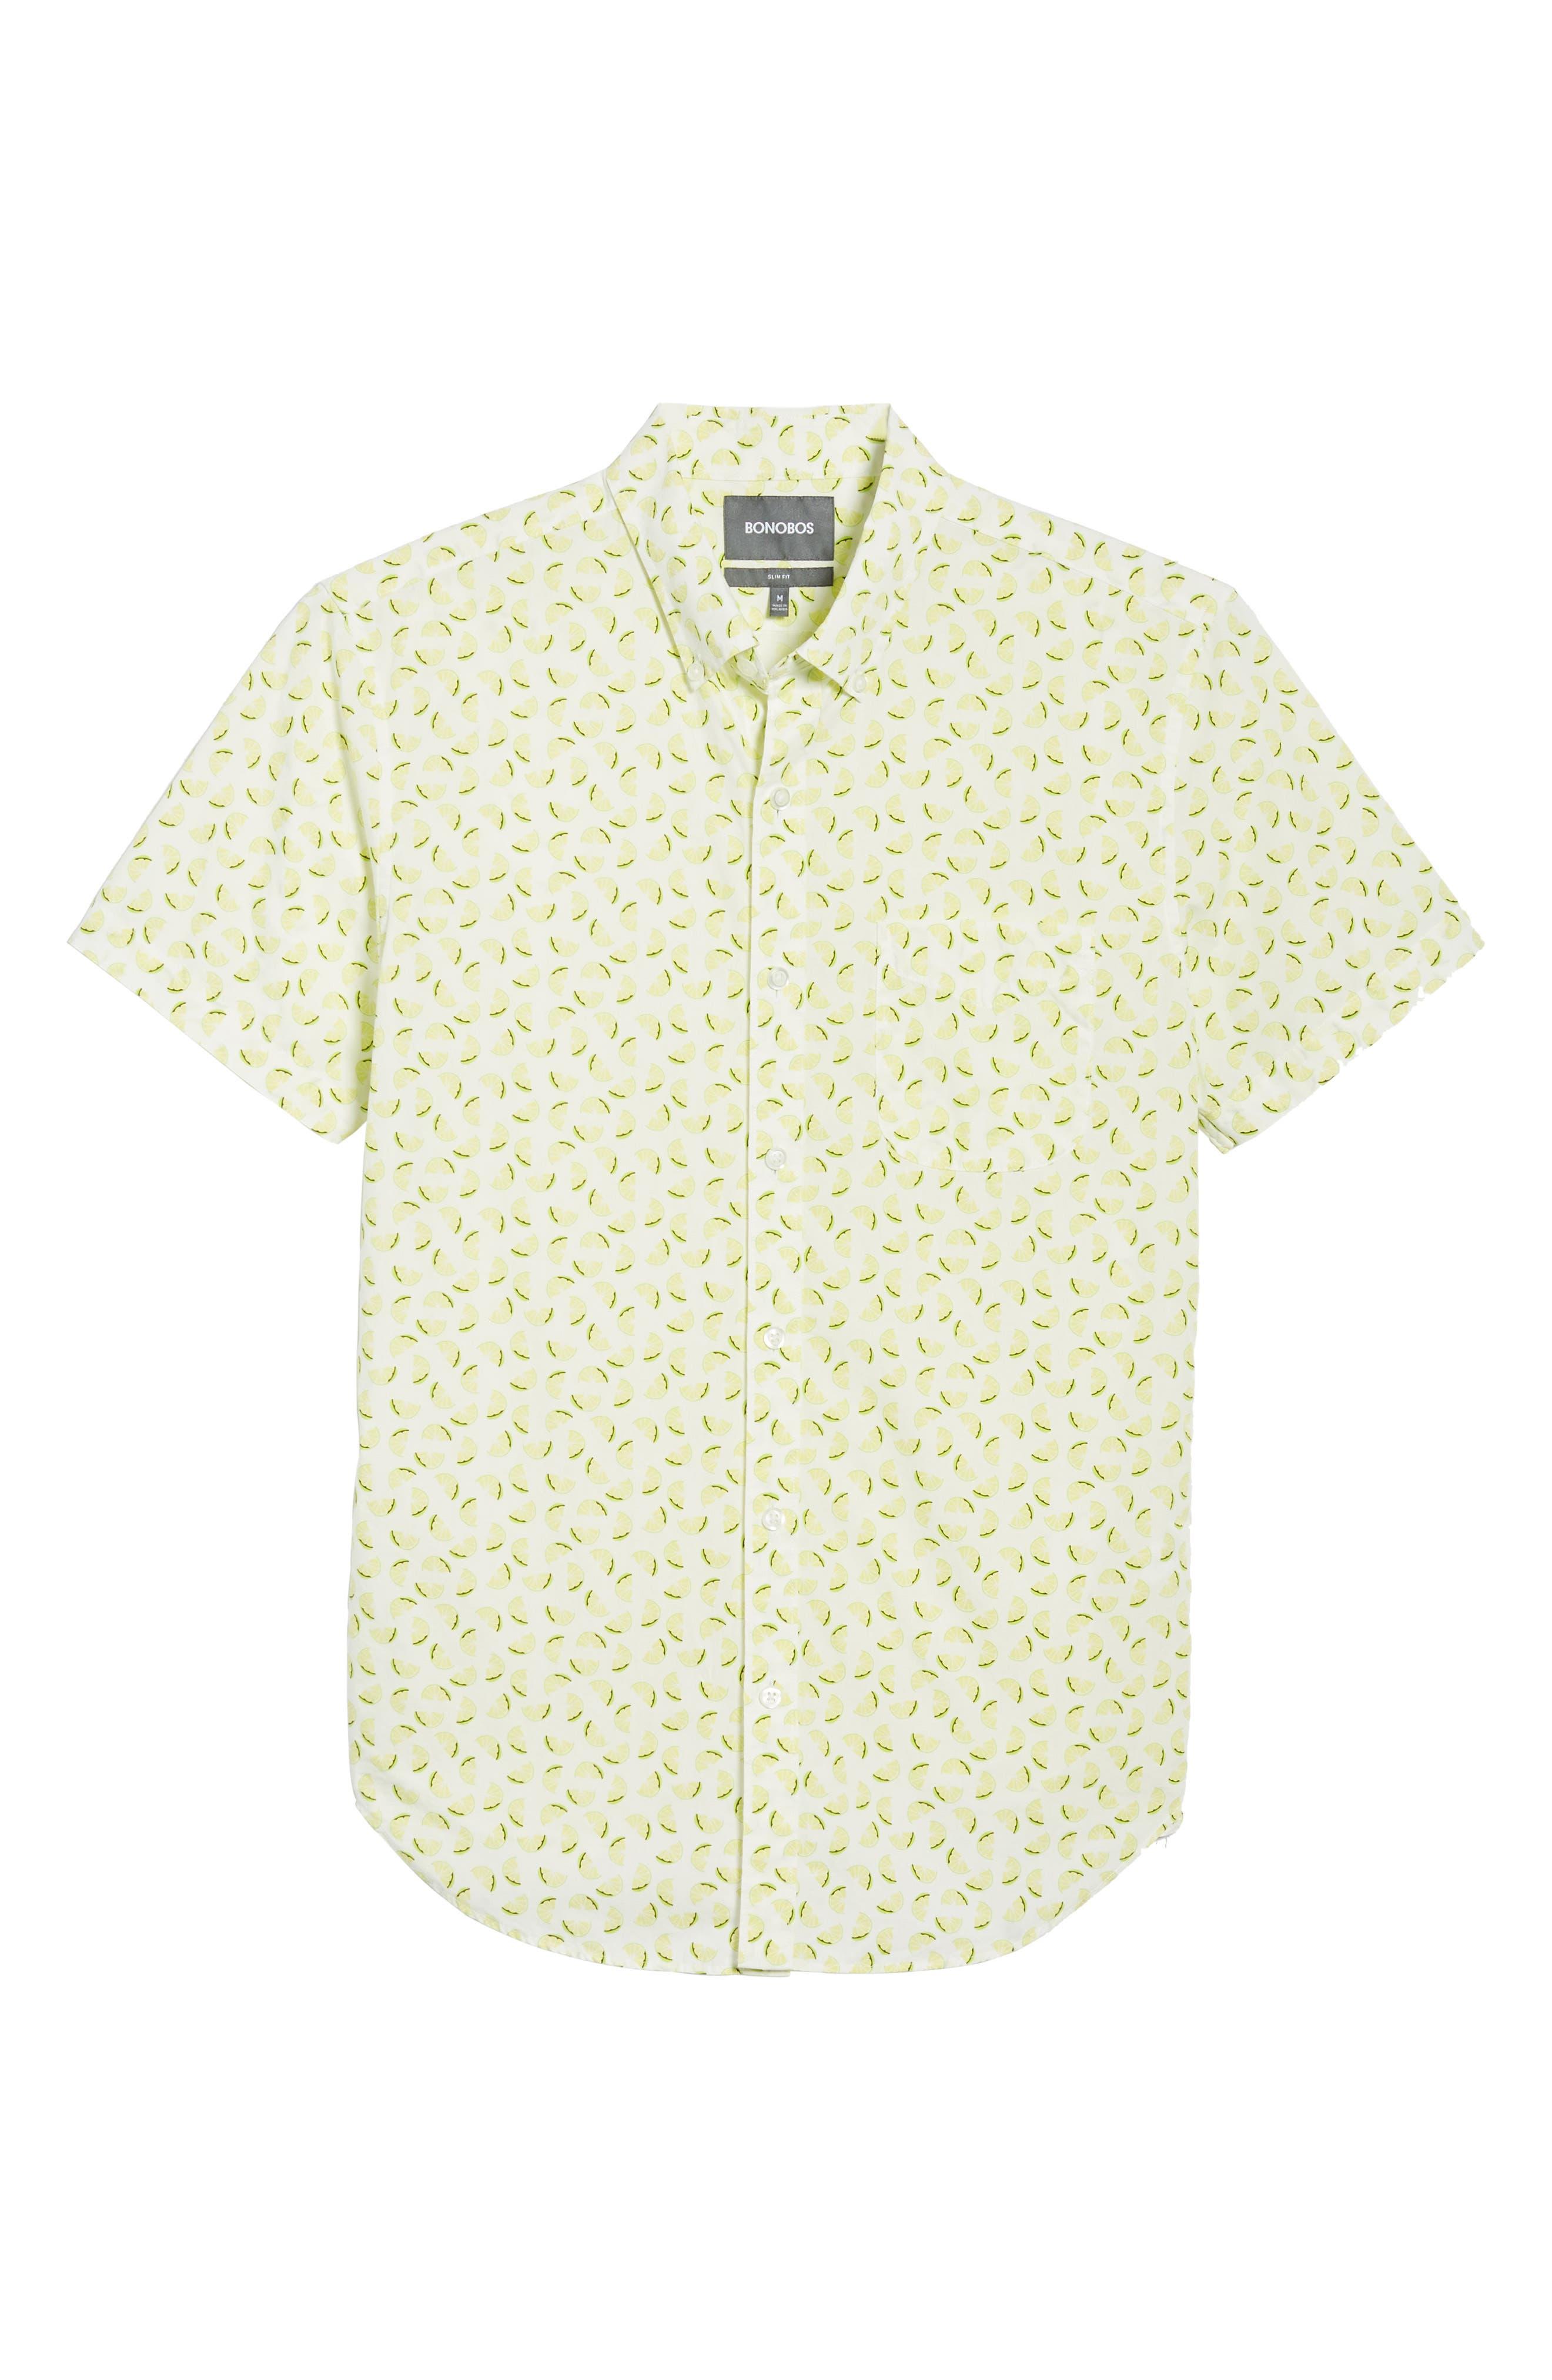 Slim Fit Citrus Print Sport Shirt,                             Alternate thumbnail 6, color,                             Lemon Toss - Acid Lime